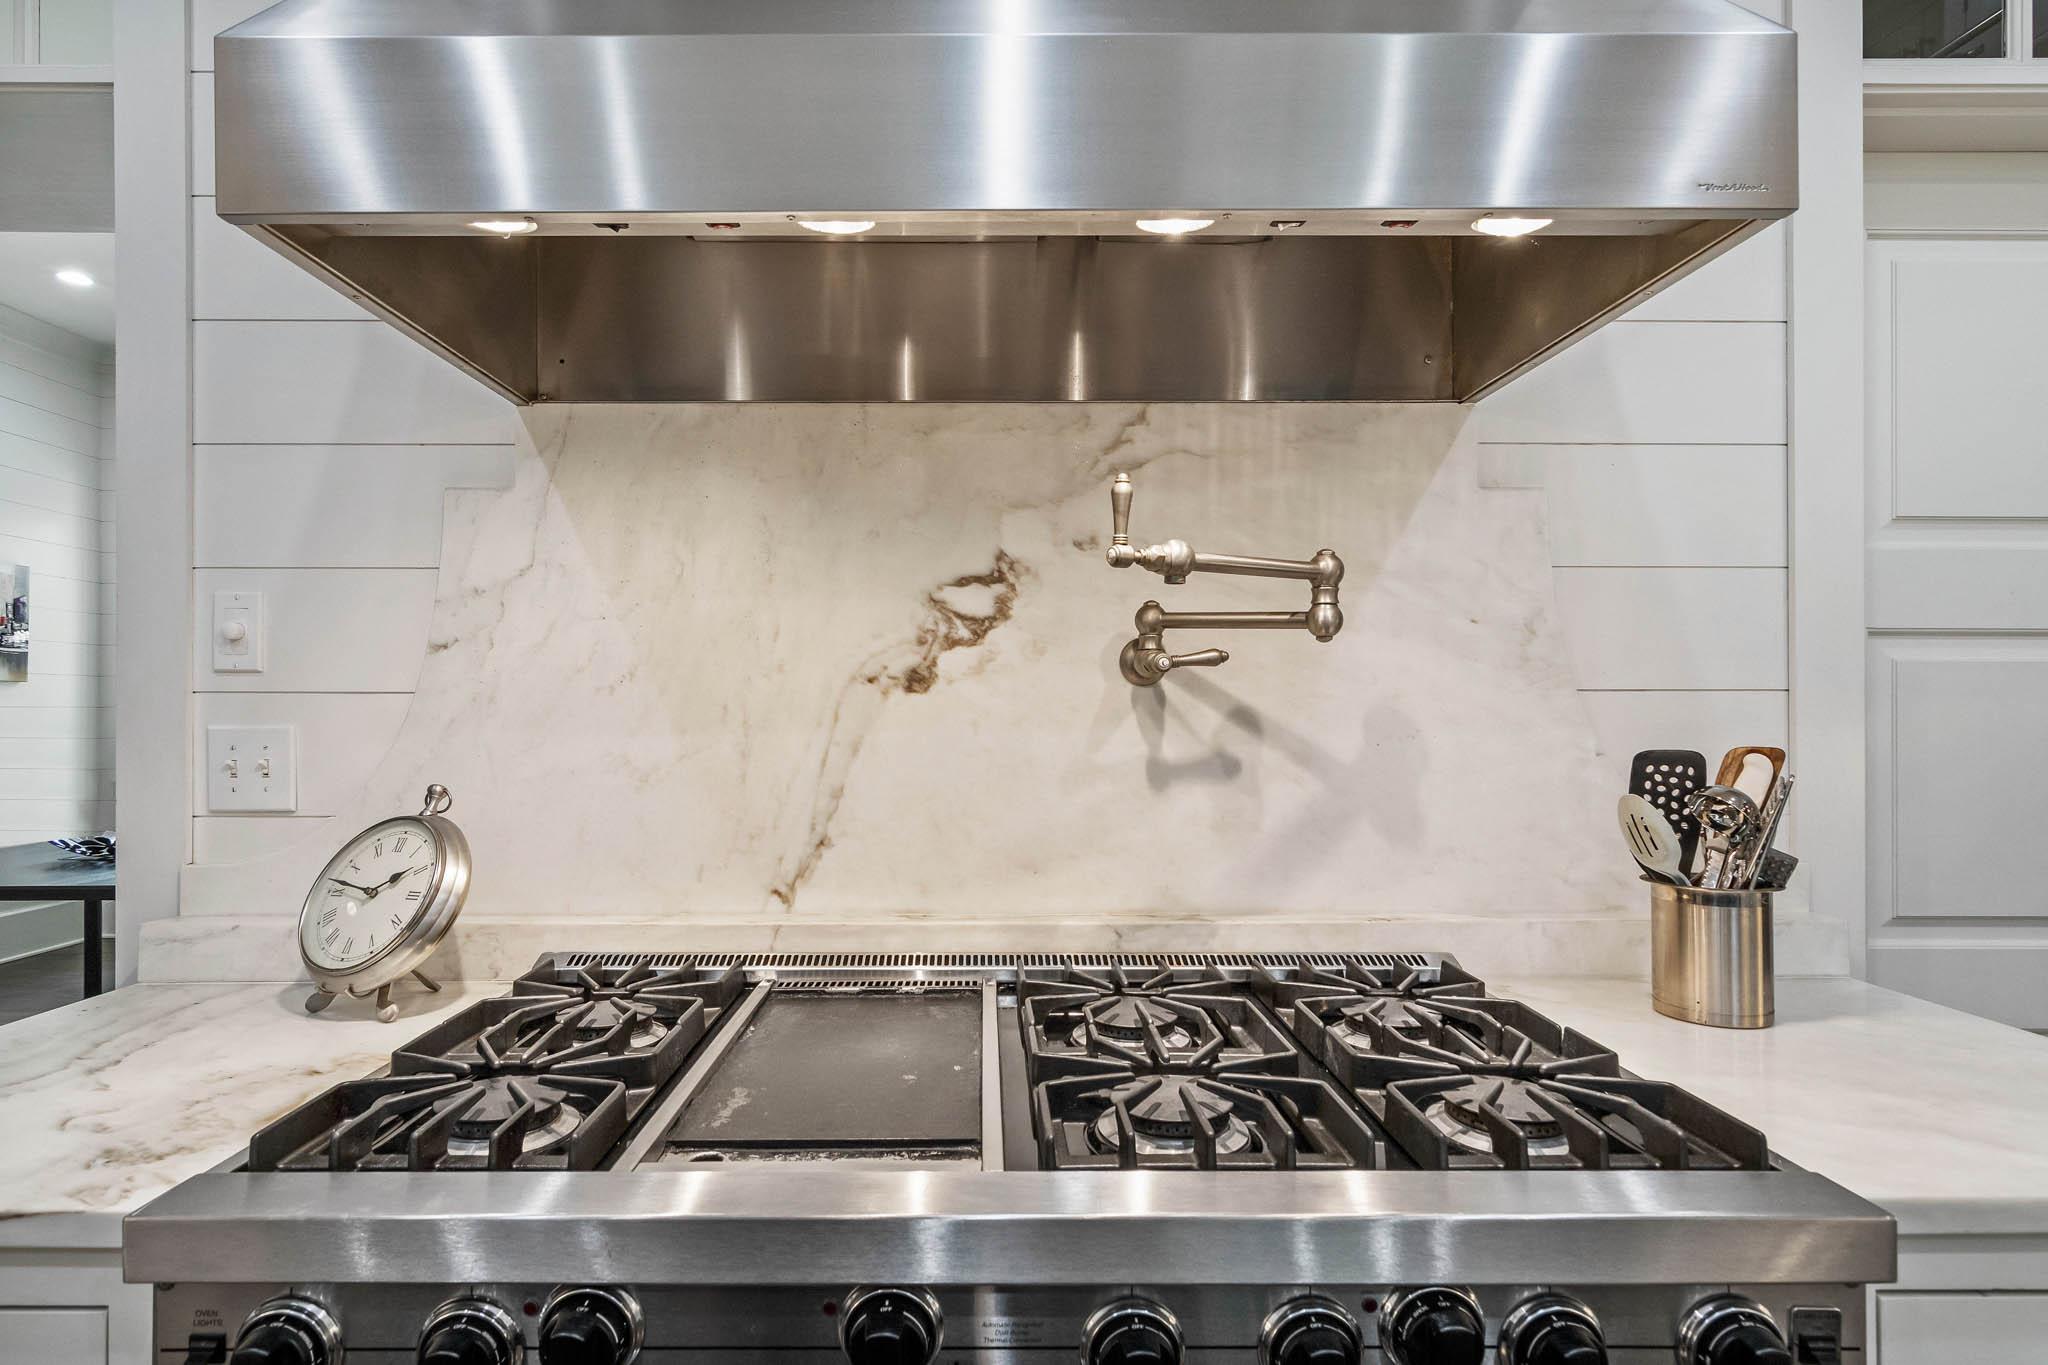 real_estate_photographer_kitchen_photography-3.jpg